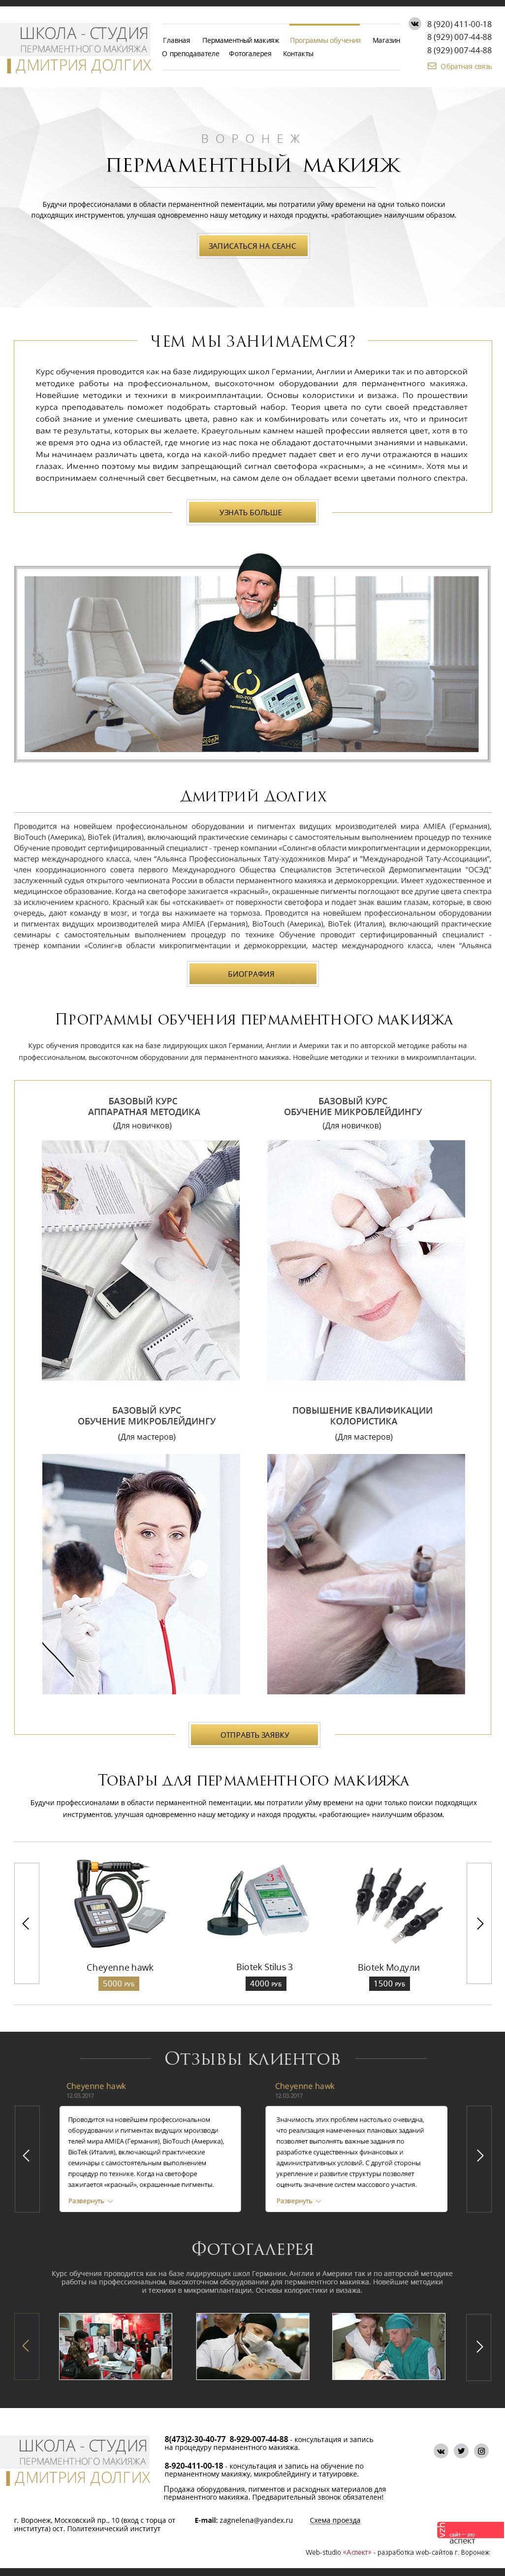 Школа-студия перманентного макияжа 1000 px